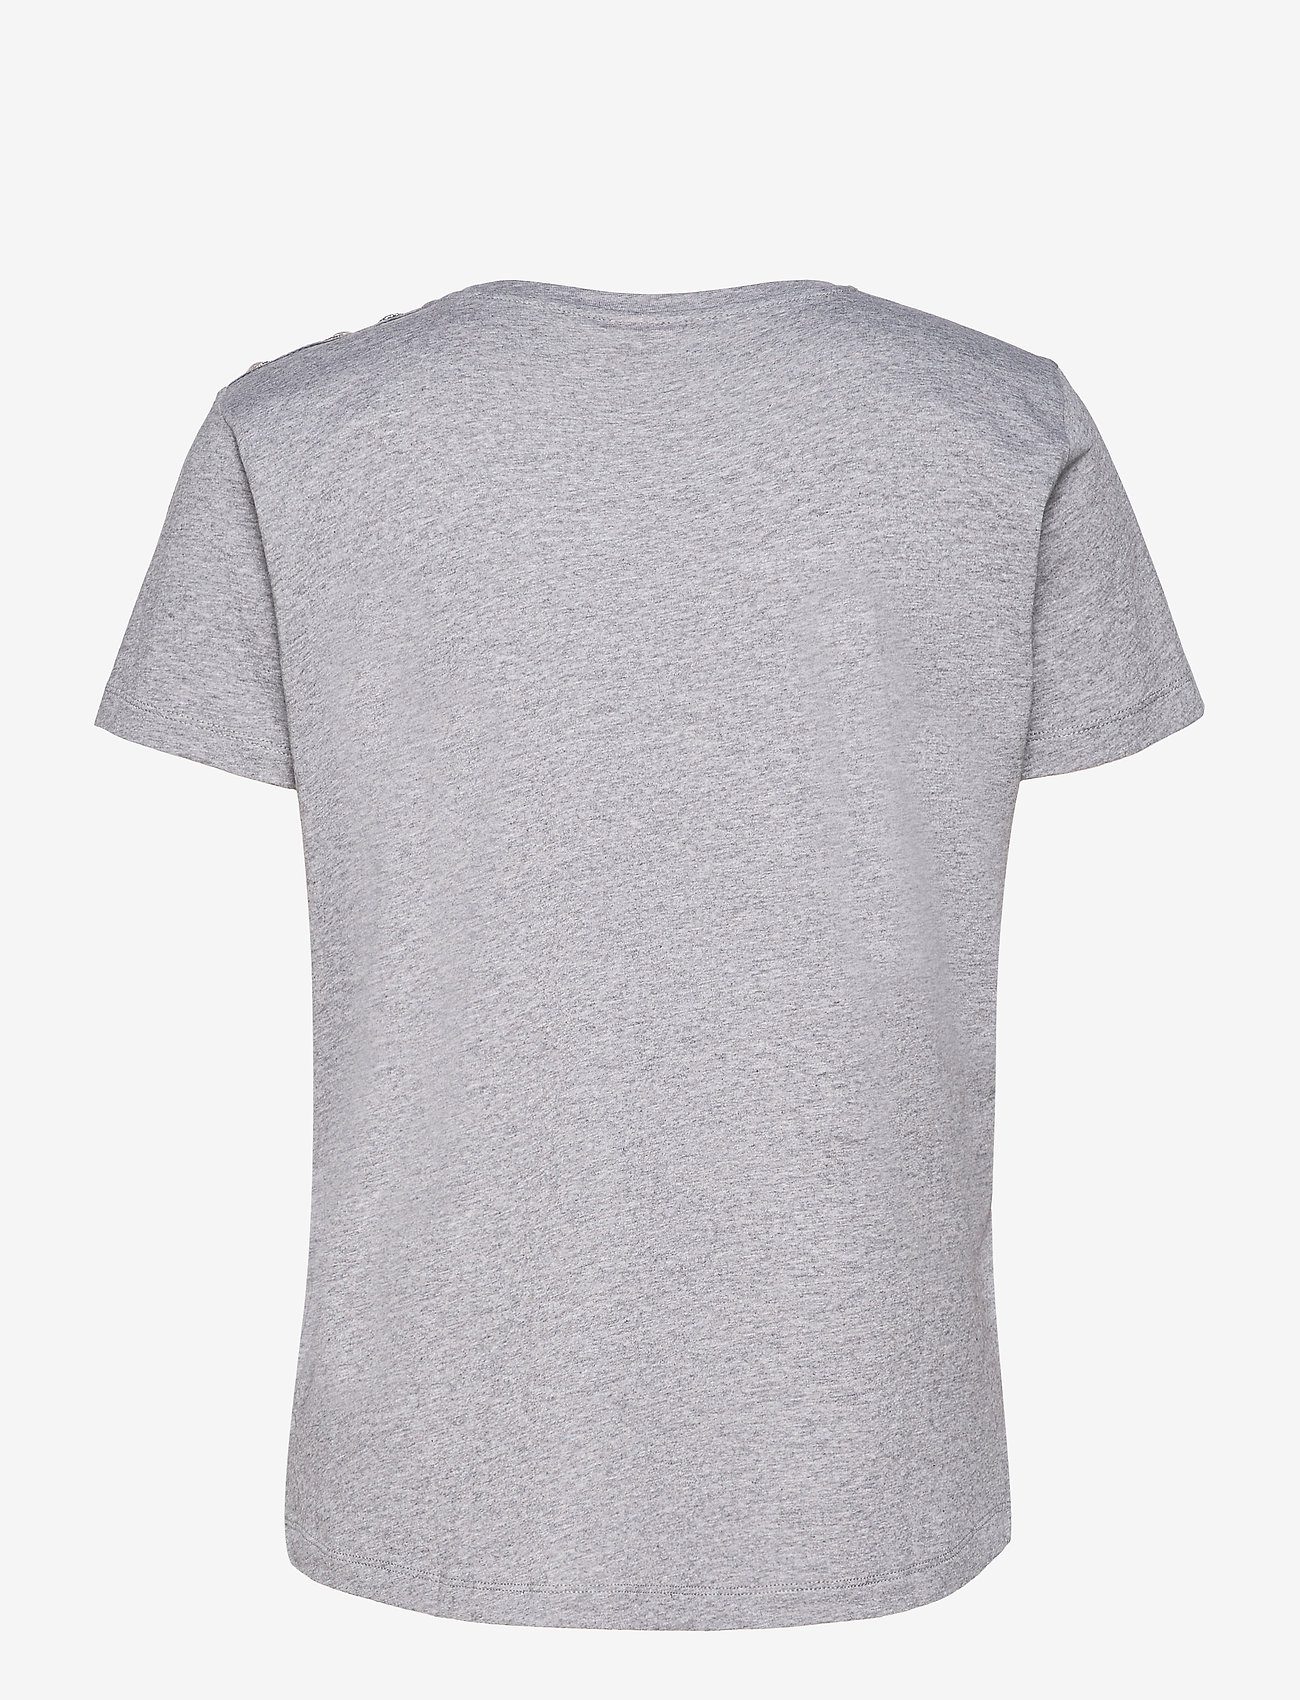 Custommade - Molly Pearl - t-shirts - grey melange - 1